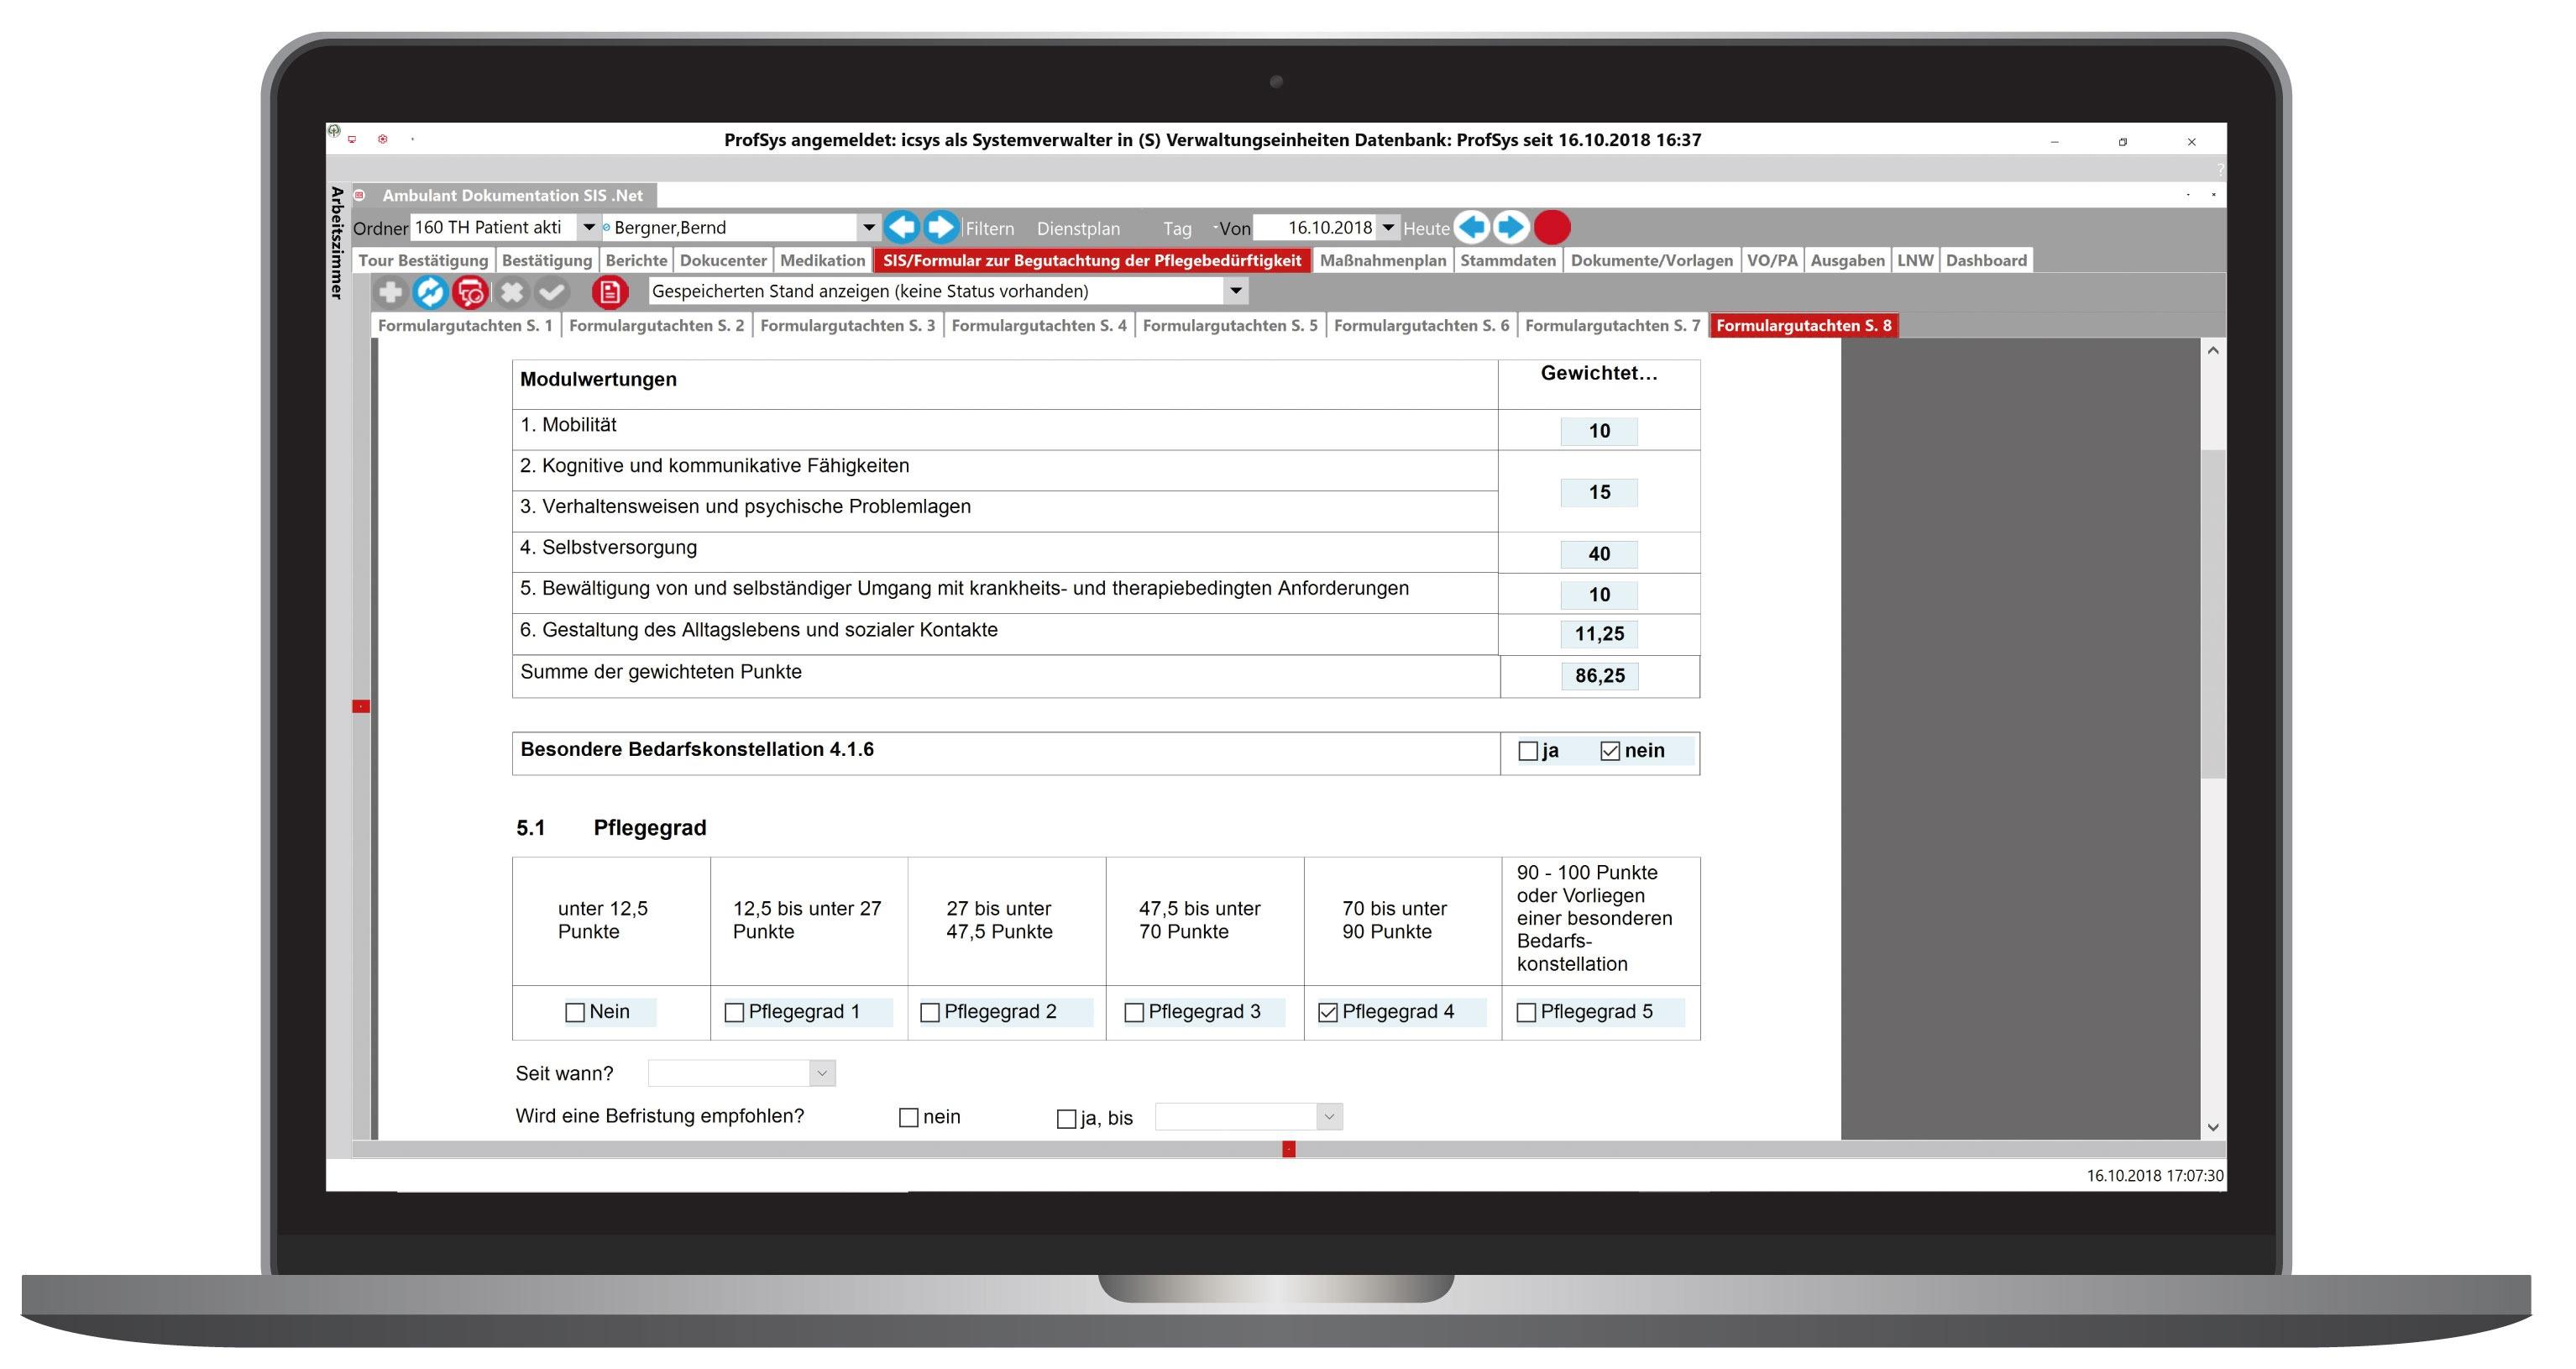 profsys_altenhilfe_ambulant_planung_und_dokumentation